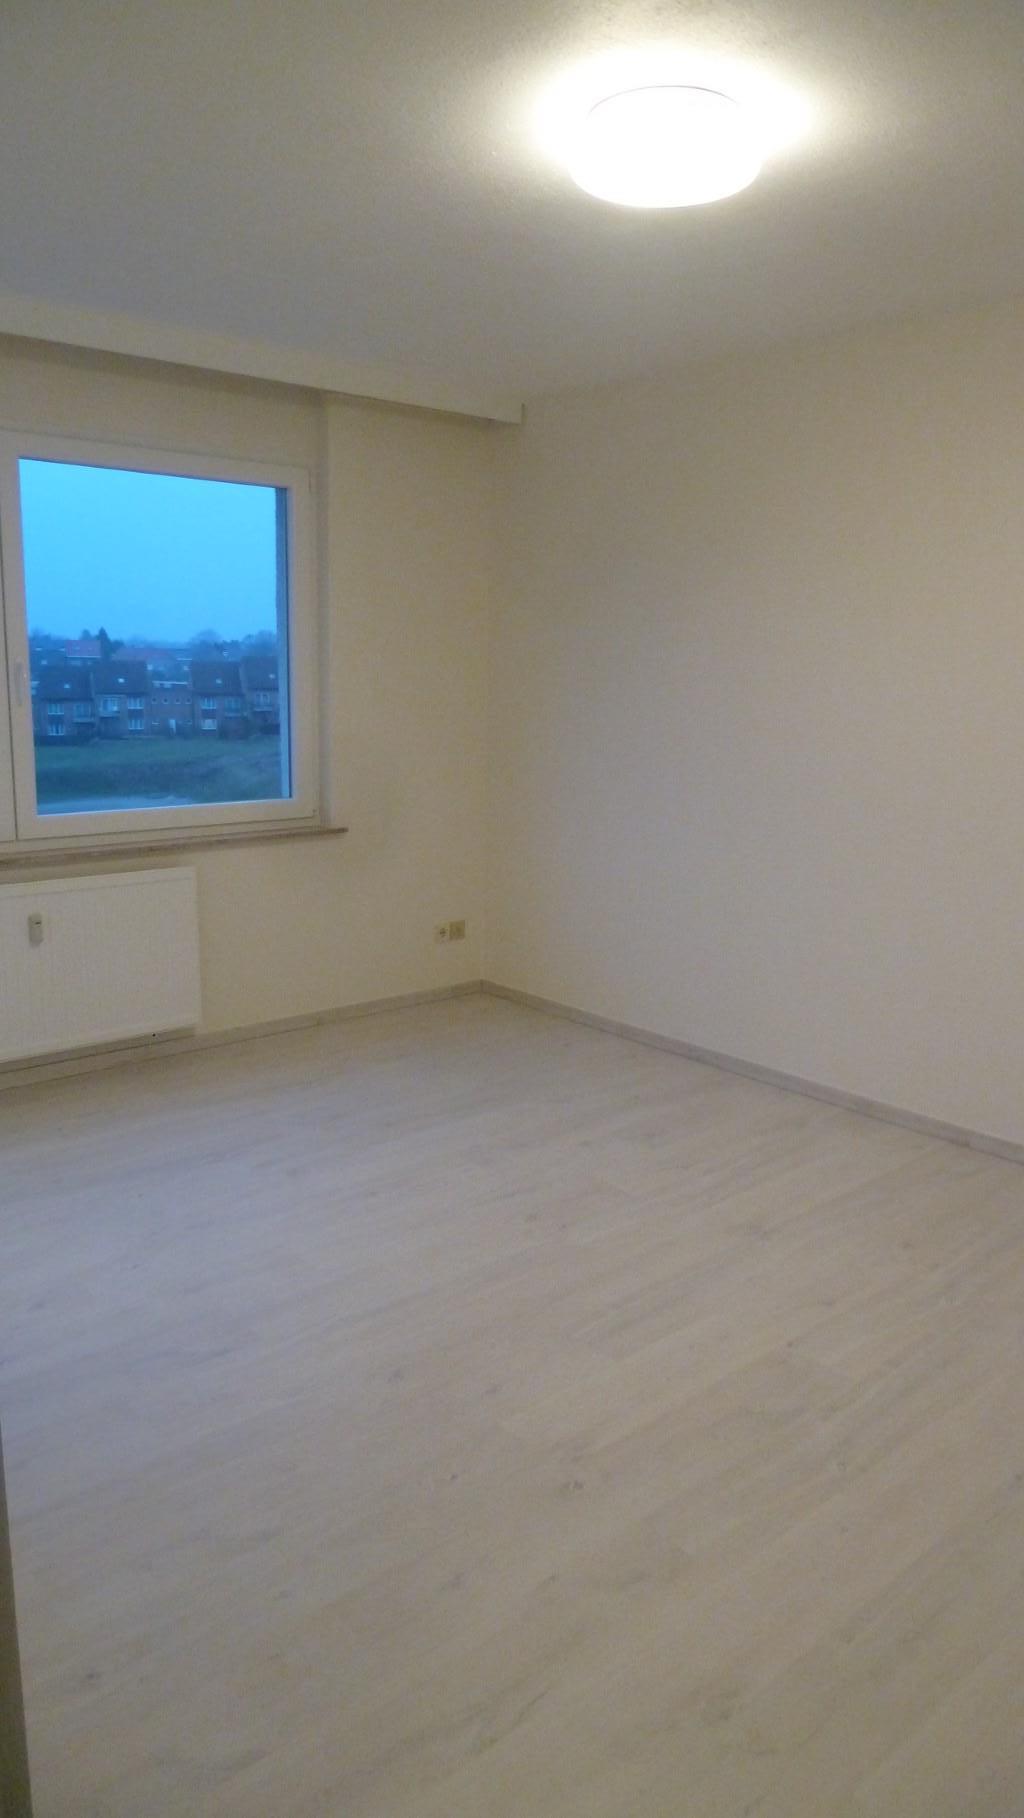 Appartement - Zaventem Sint-Stevens-Woluwe - #3970084-9